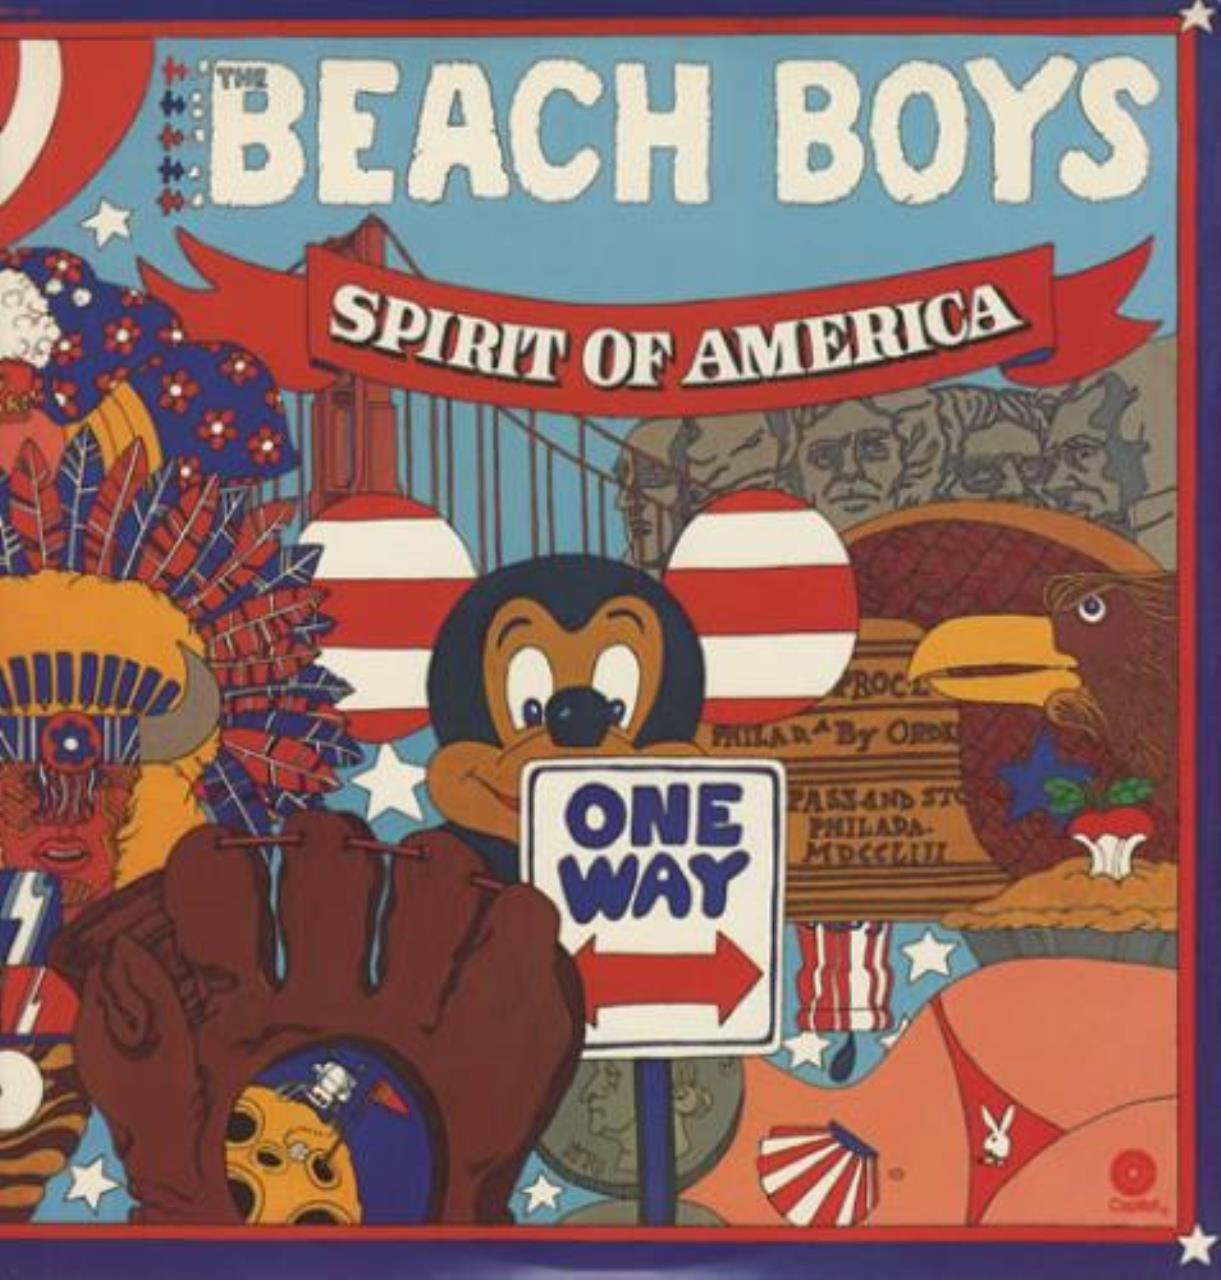 Spirit of America by -